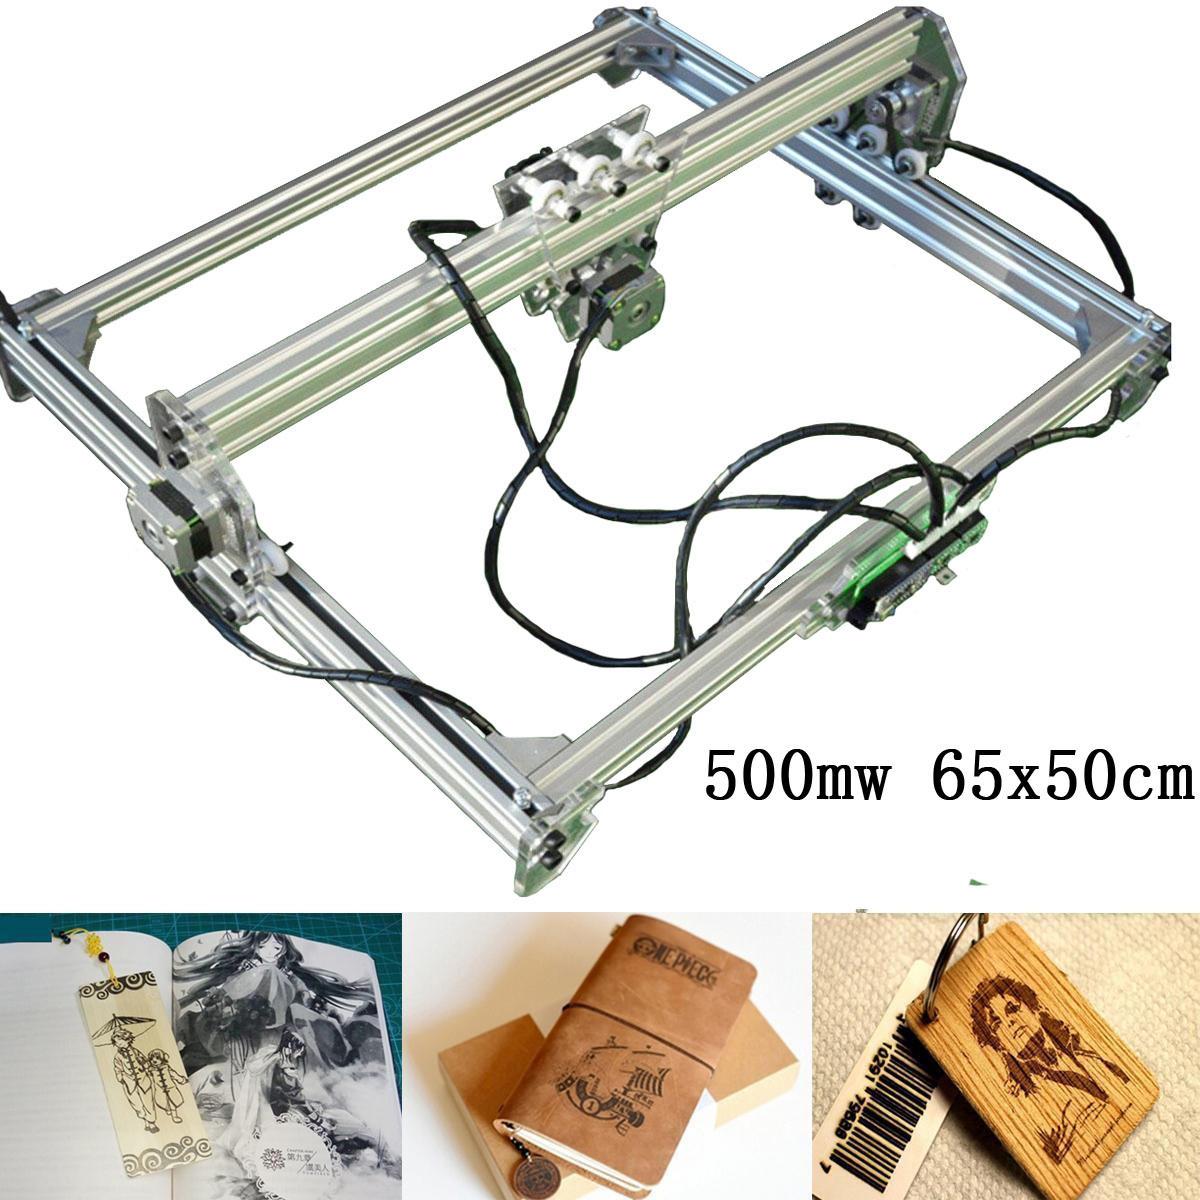 500mW Laser Engraver